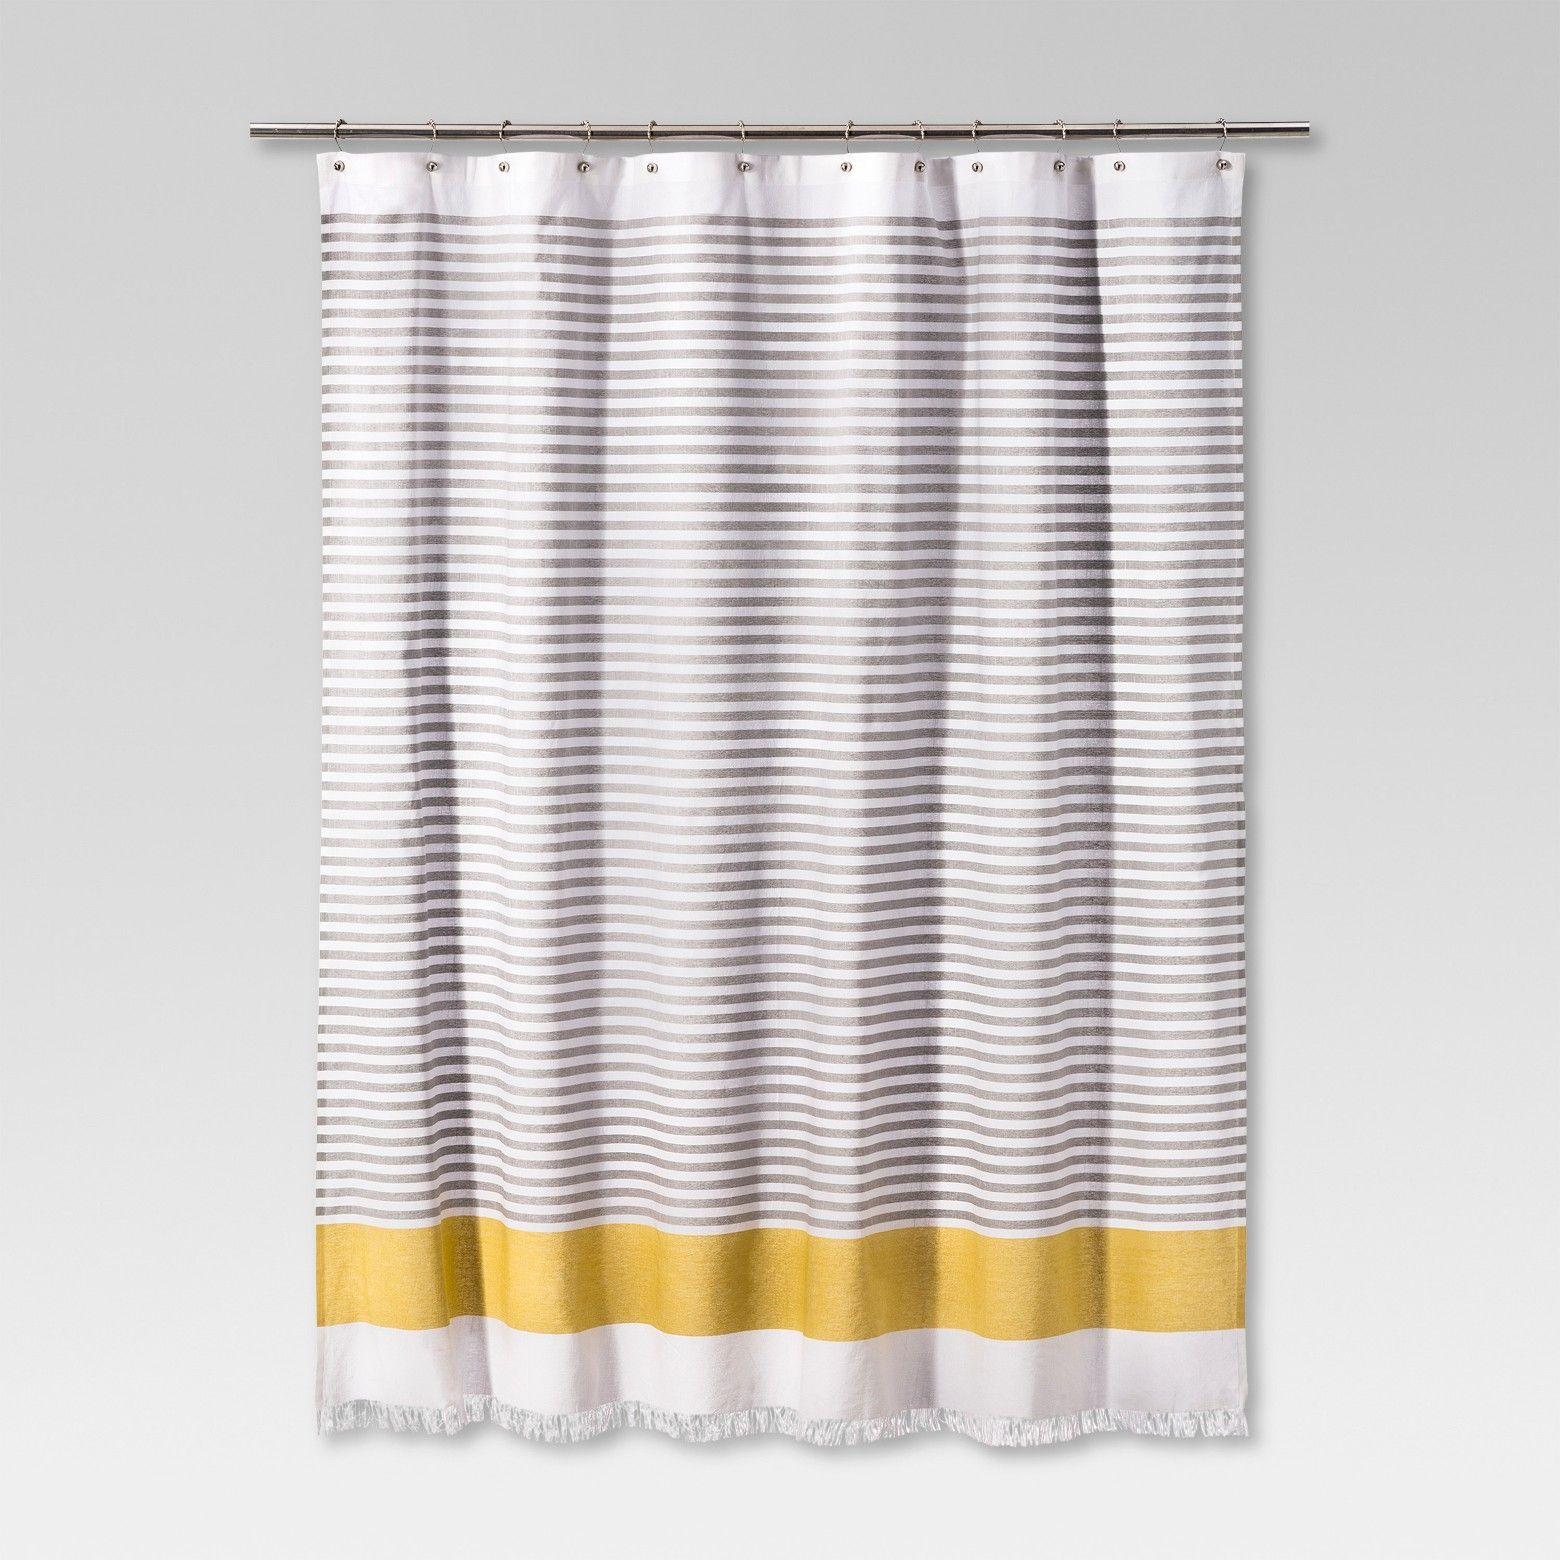 Dyed Shower Curtain Stripe Summer Wheat Project 62 Bathroom Shower Curtains Gray Shower Curtains Yellow Shower Curtains